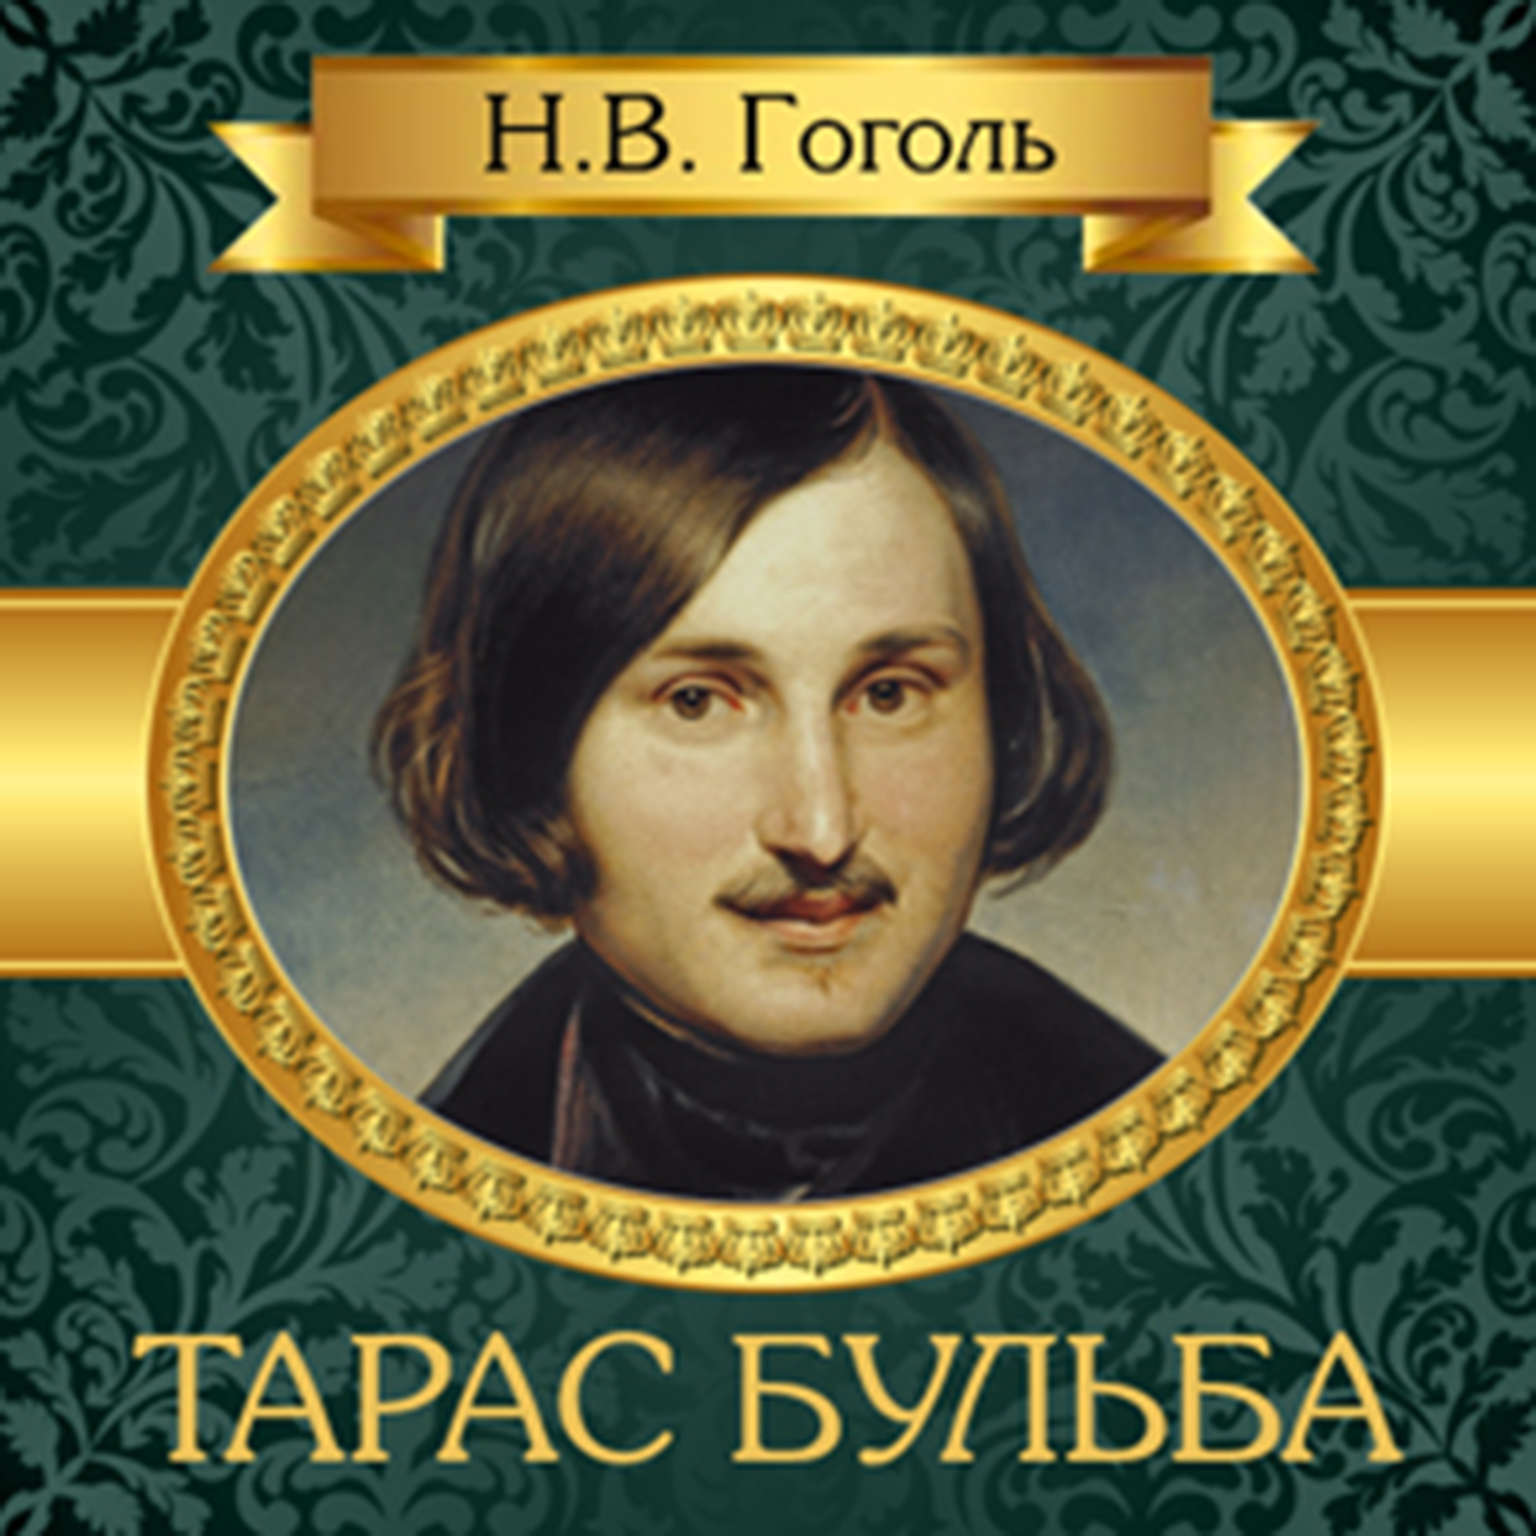 Taras Bulba [Russian Edition] Audiobook, by Nikolai Gogol